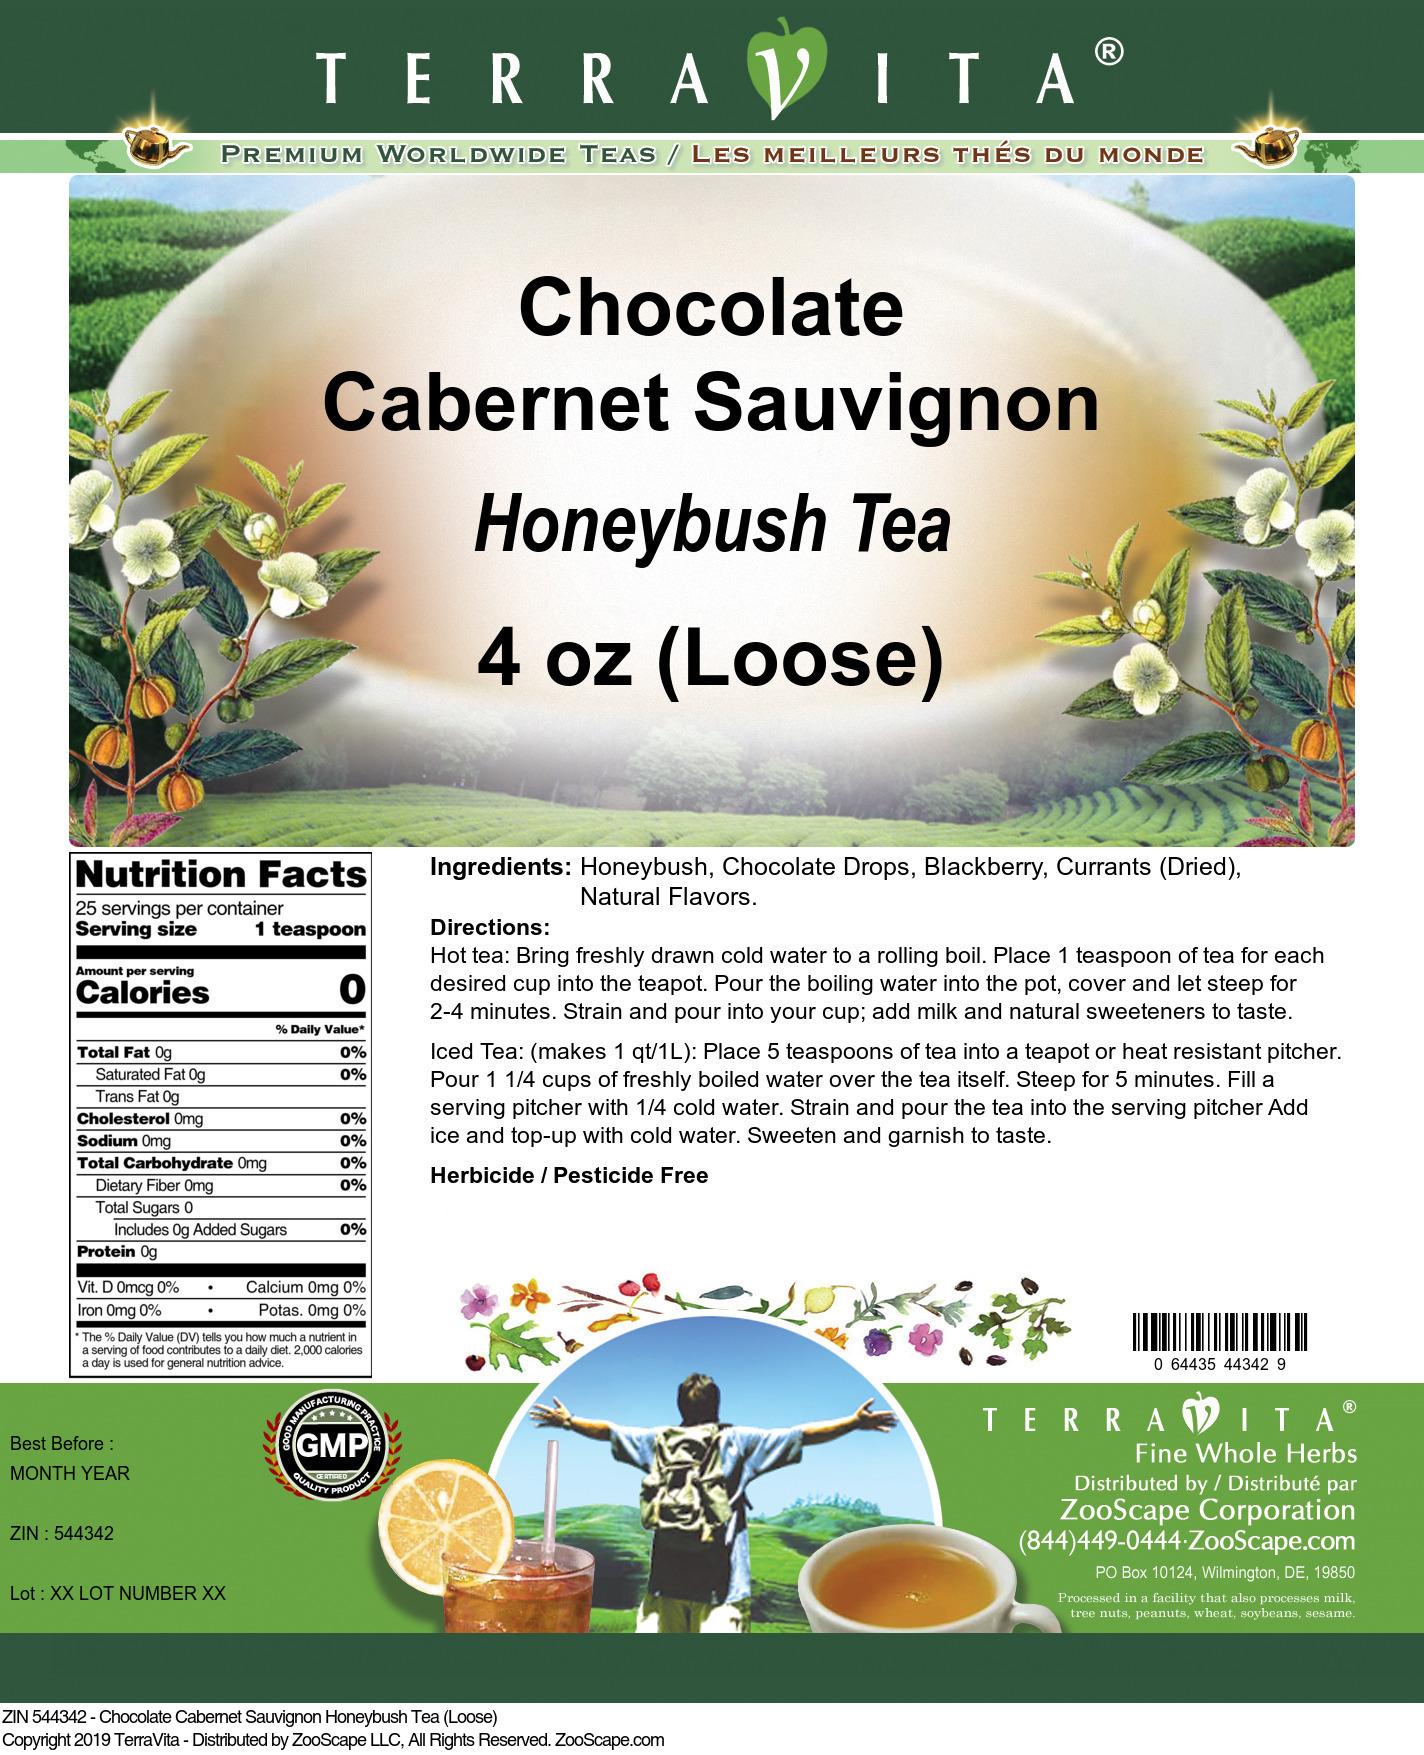 Chocolate Cabernet Sauvignon Honeybush Tea (Loose)